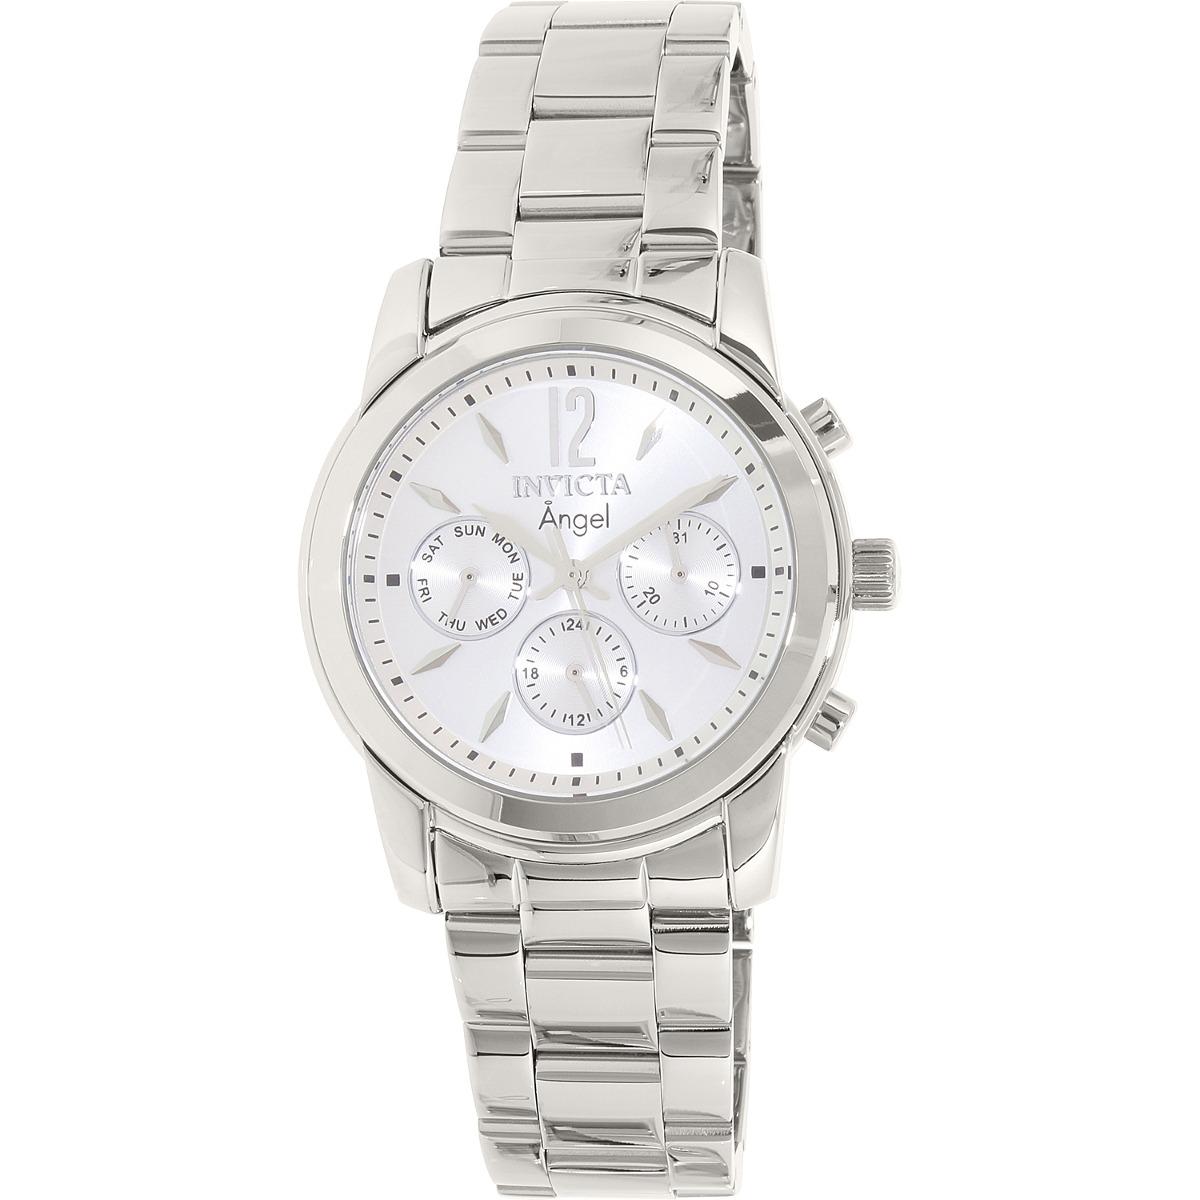 Reloj Invicta Angel 0461 Suizo Acero Inoxidable Para Mujer ... 0c91d7131c77